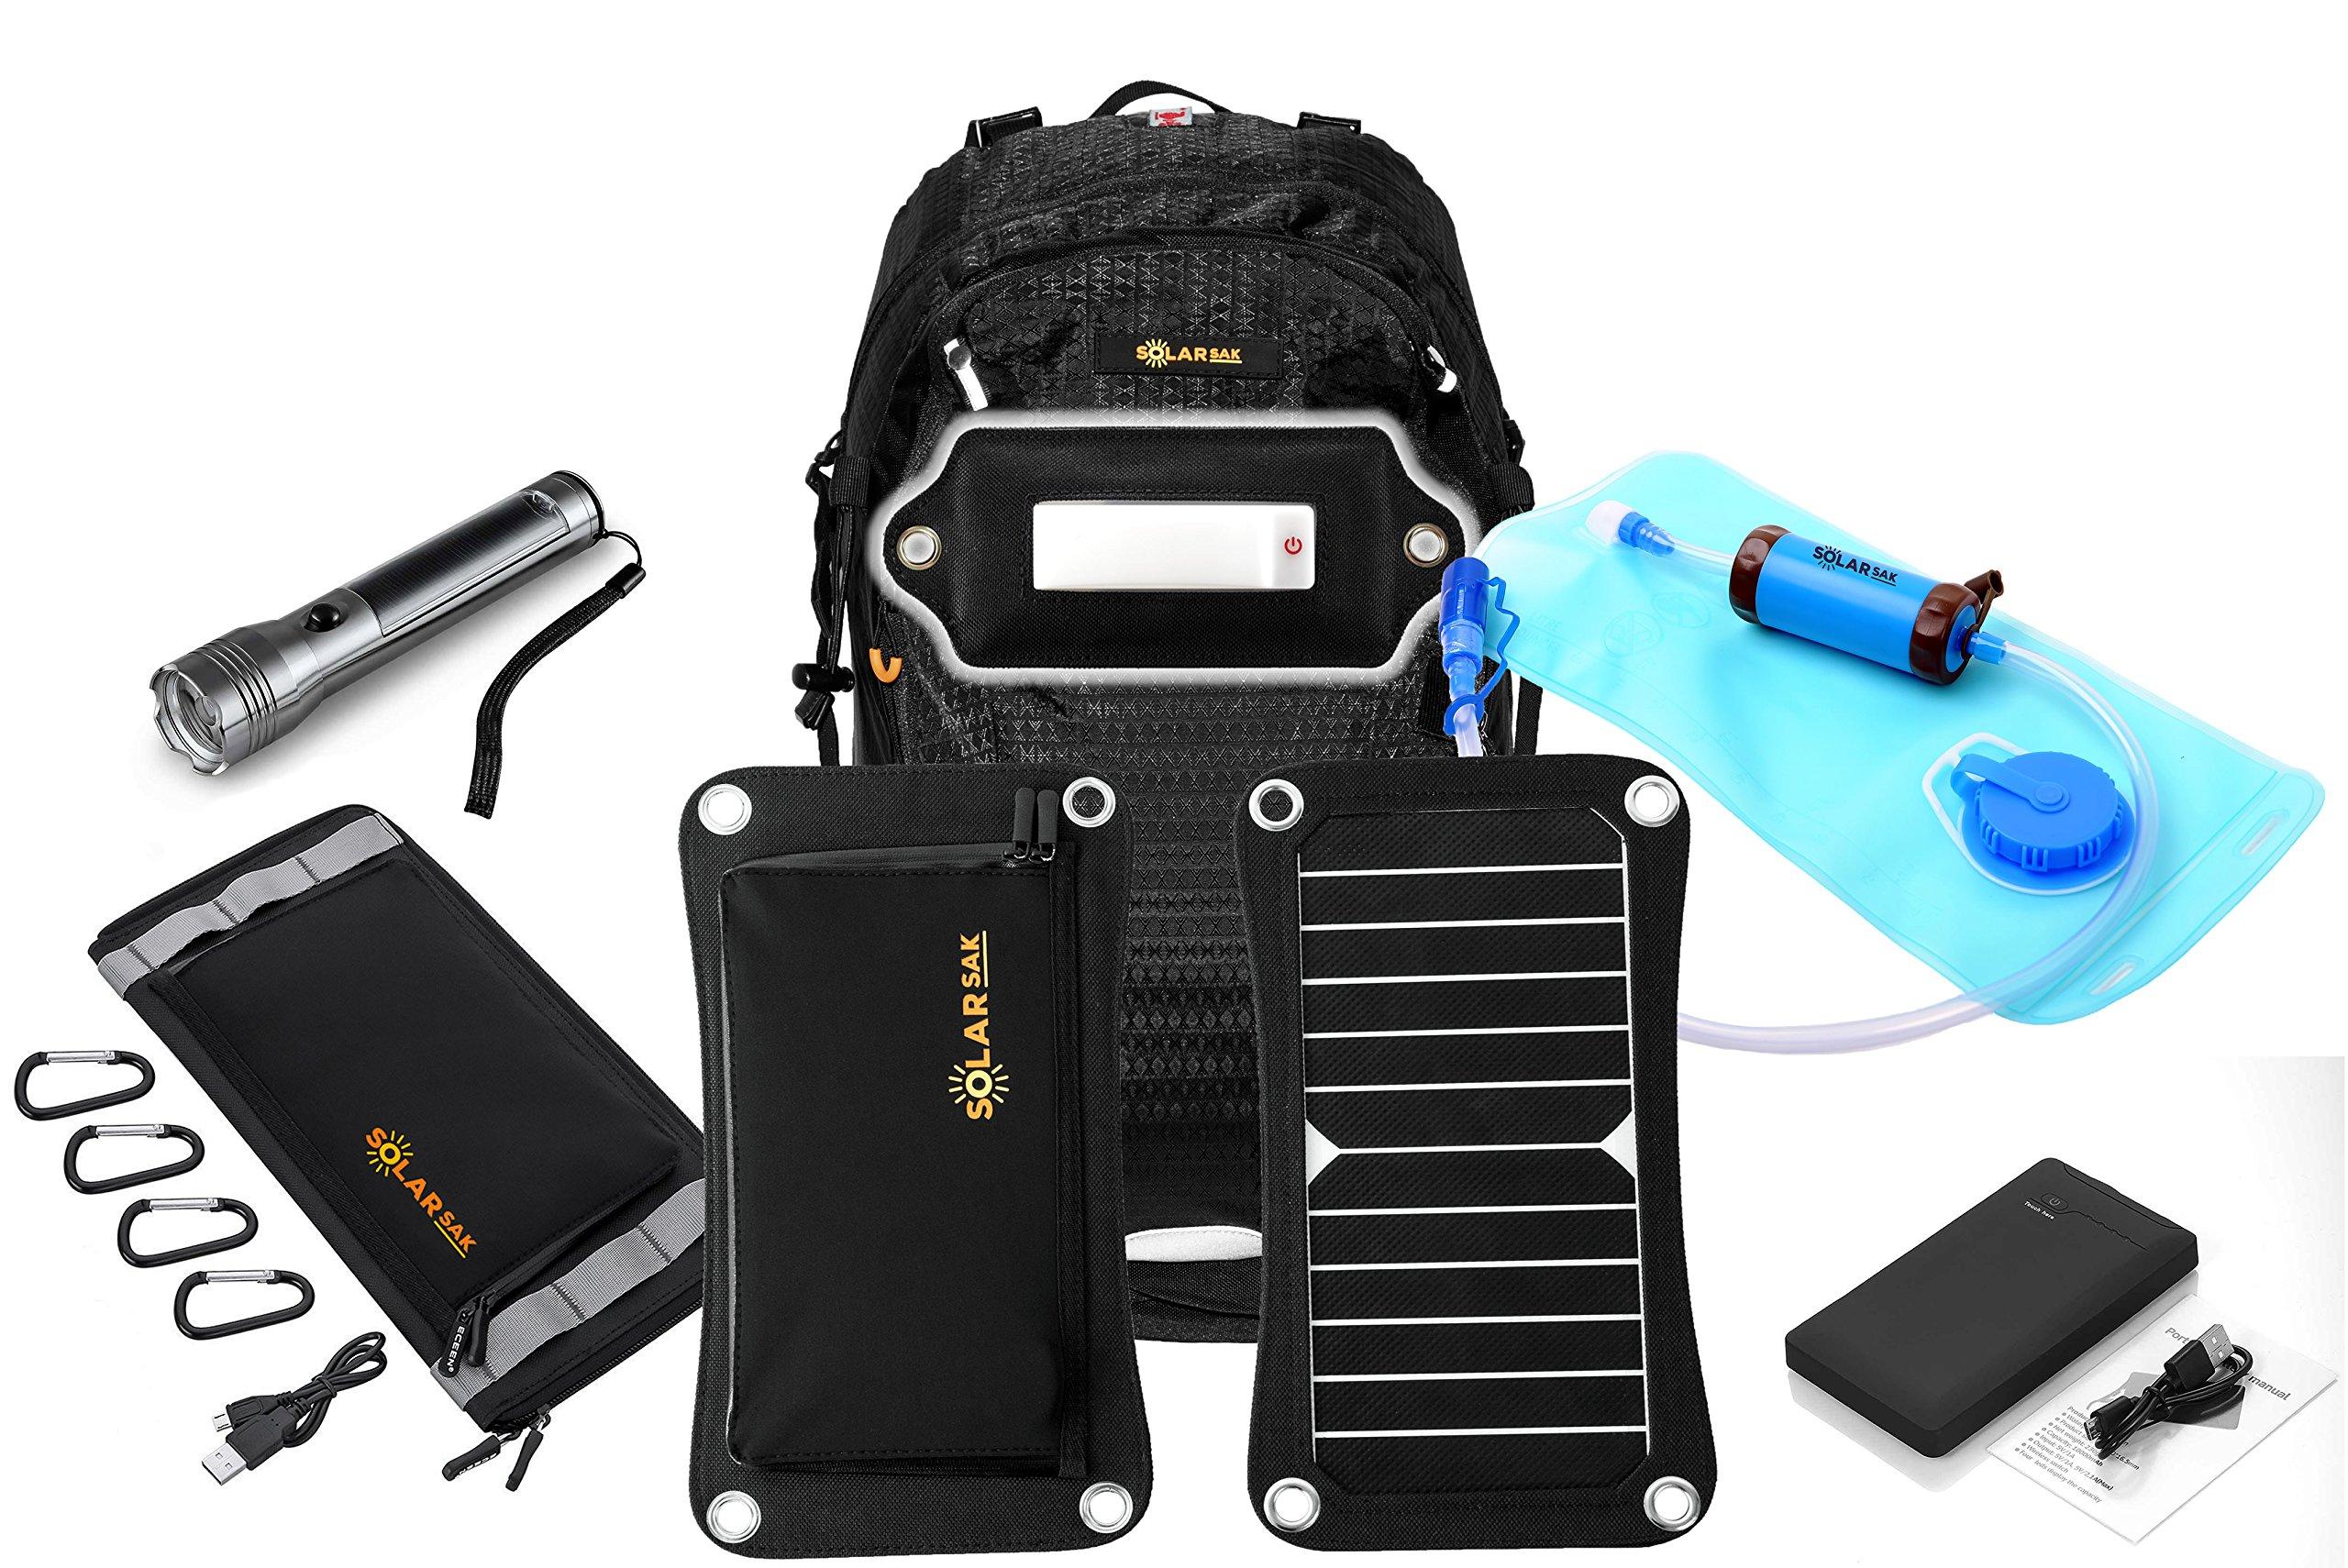 SolarSak INFINITY survival kit w/ water filtering solar hydration backpack - 7W SUN PIECE panel - 10W SUN PIECE portable solar - MOON PIECE LED light - solar flashlight - 10000mah battery